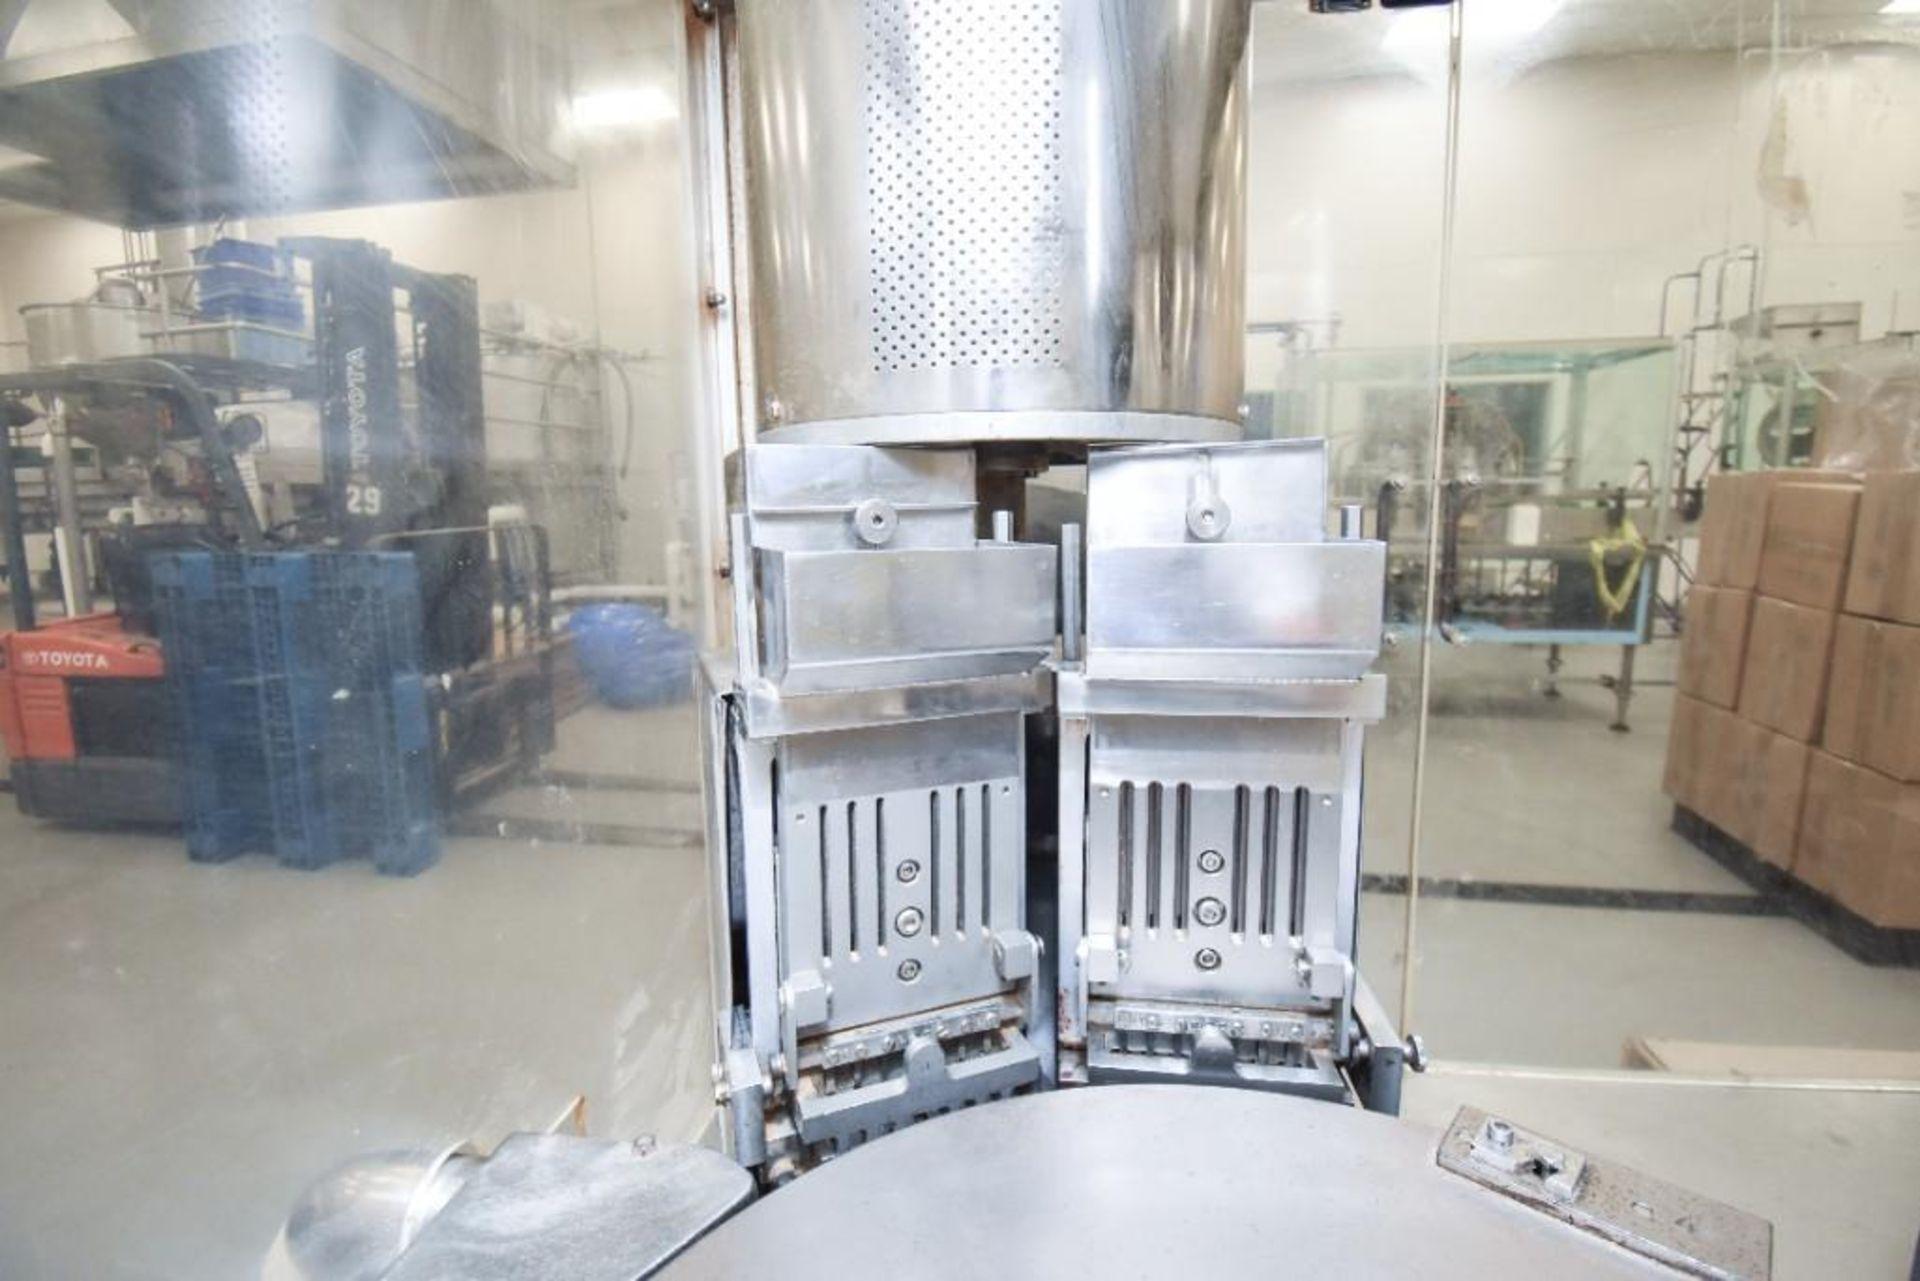 GFK 1500 Bosch Encapsulation Machine - Image 7 of 11